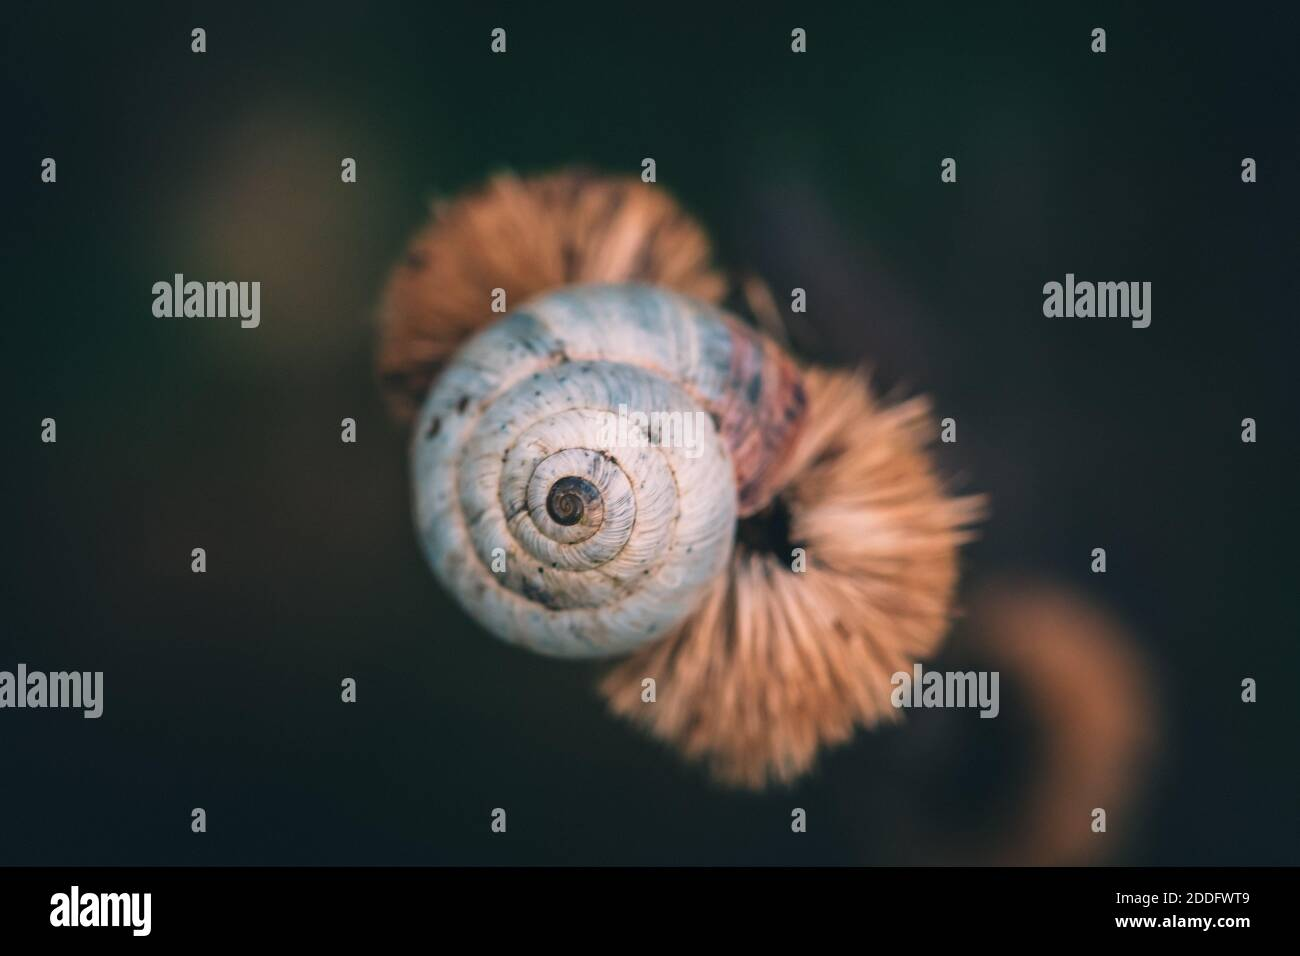 a macro image of a shrub snail or Genus Praticolella on a seed pod close up Stock Photo